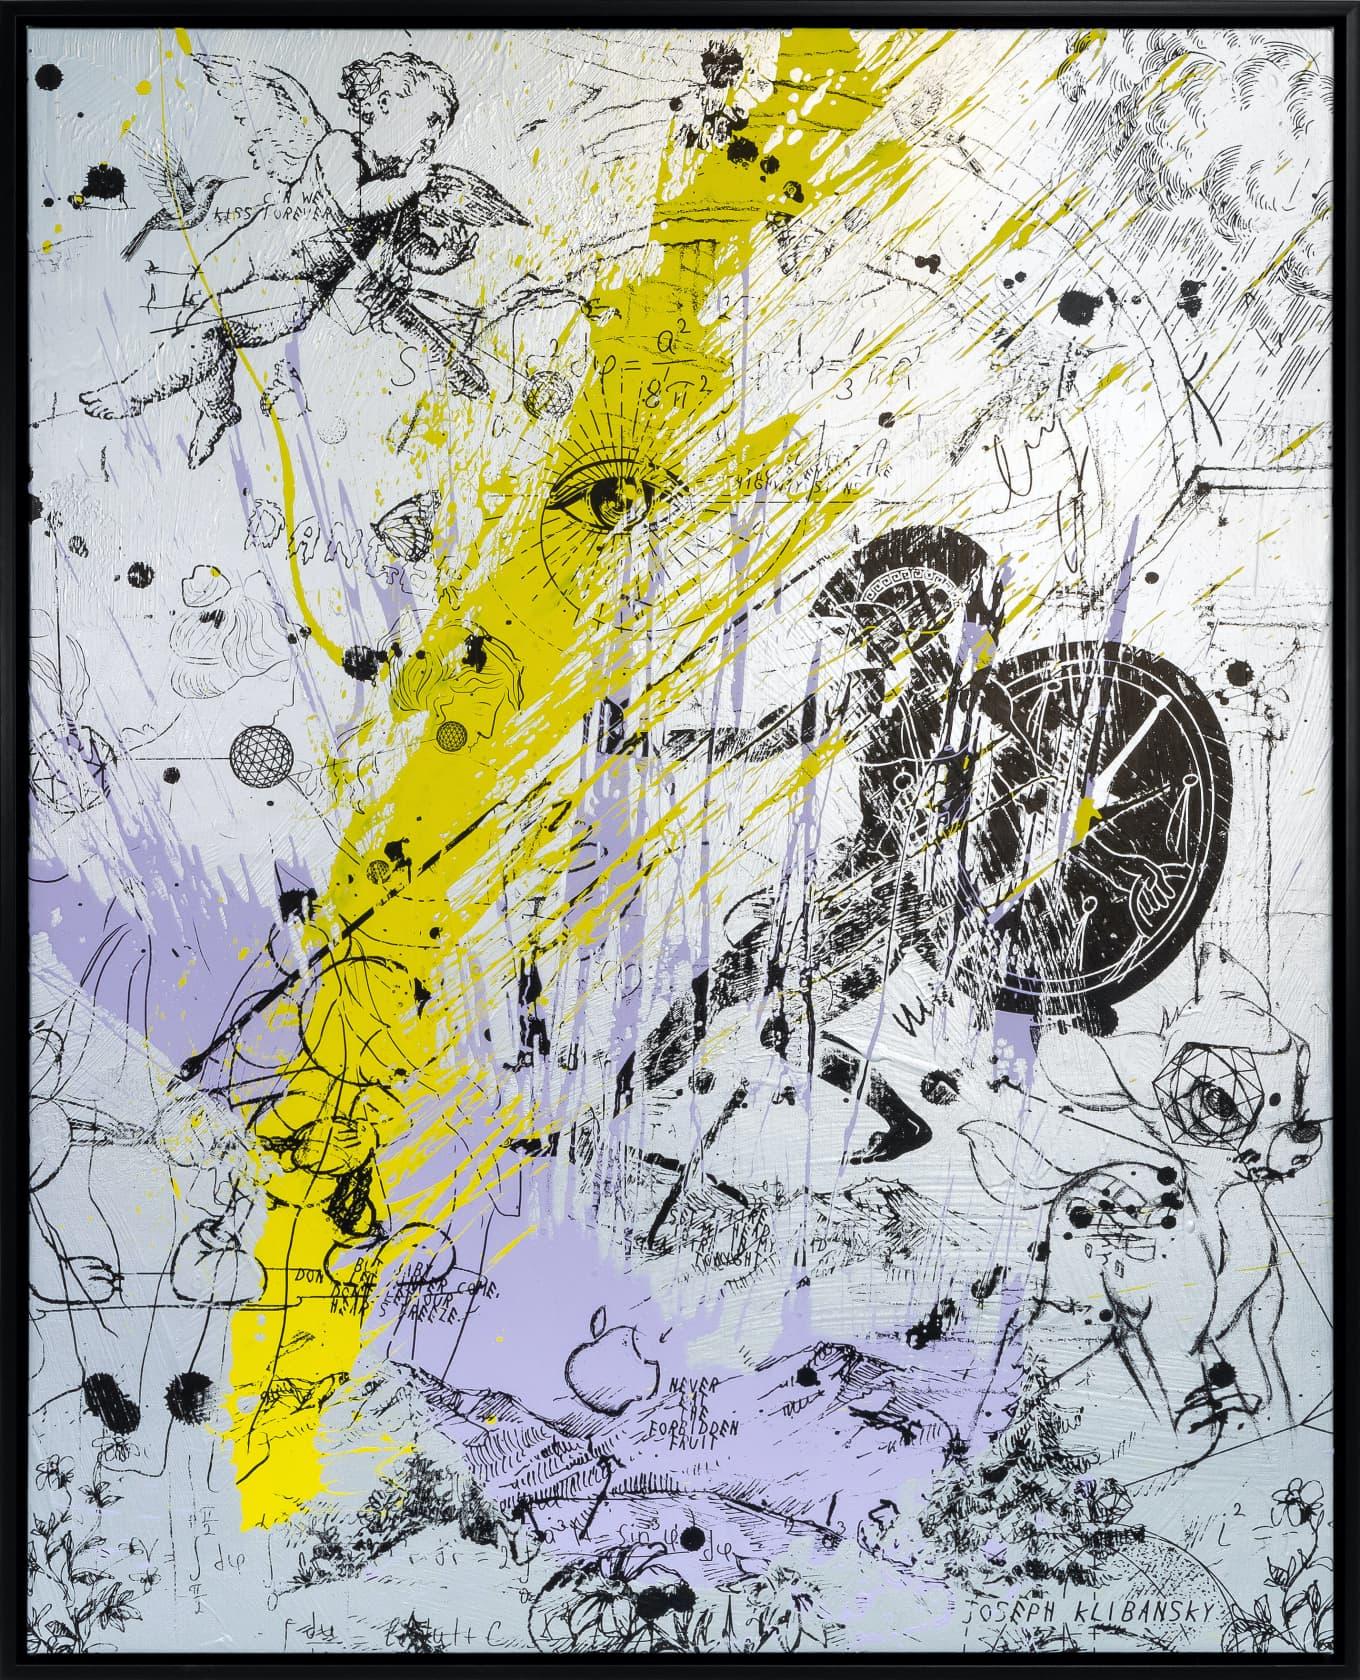 Joseph Klibansky, Into My Heart (Silver/Black, Lilac and Yellow Splash), 2020, 2021